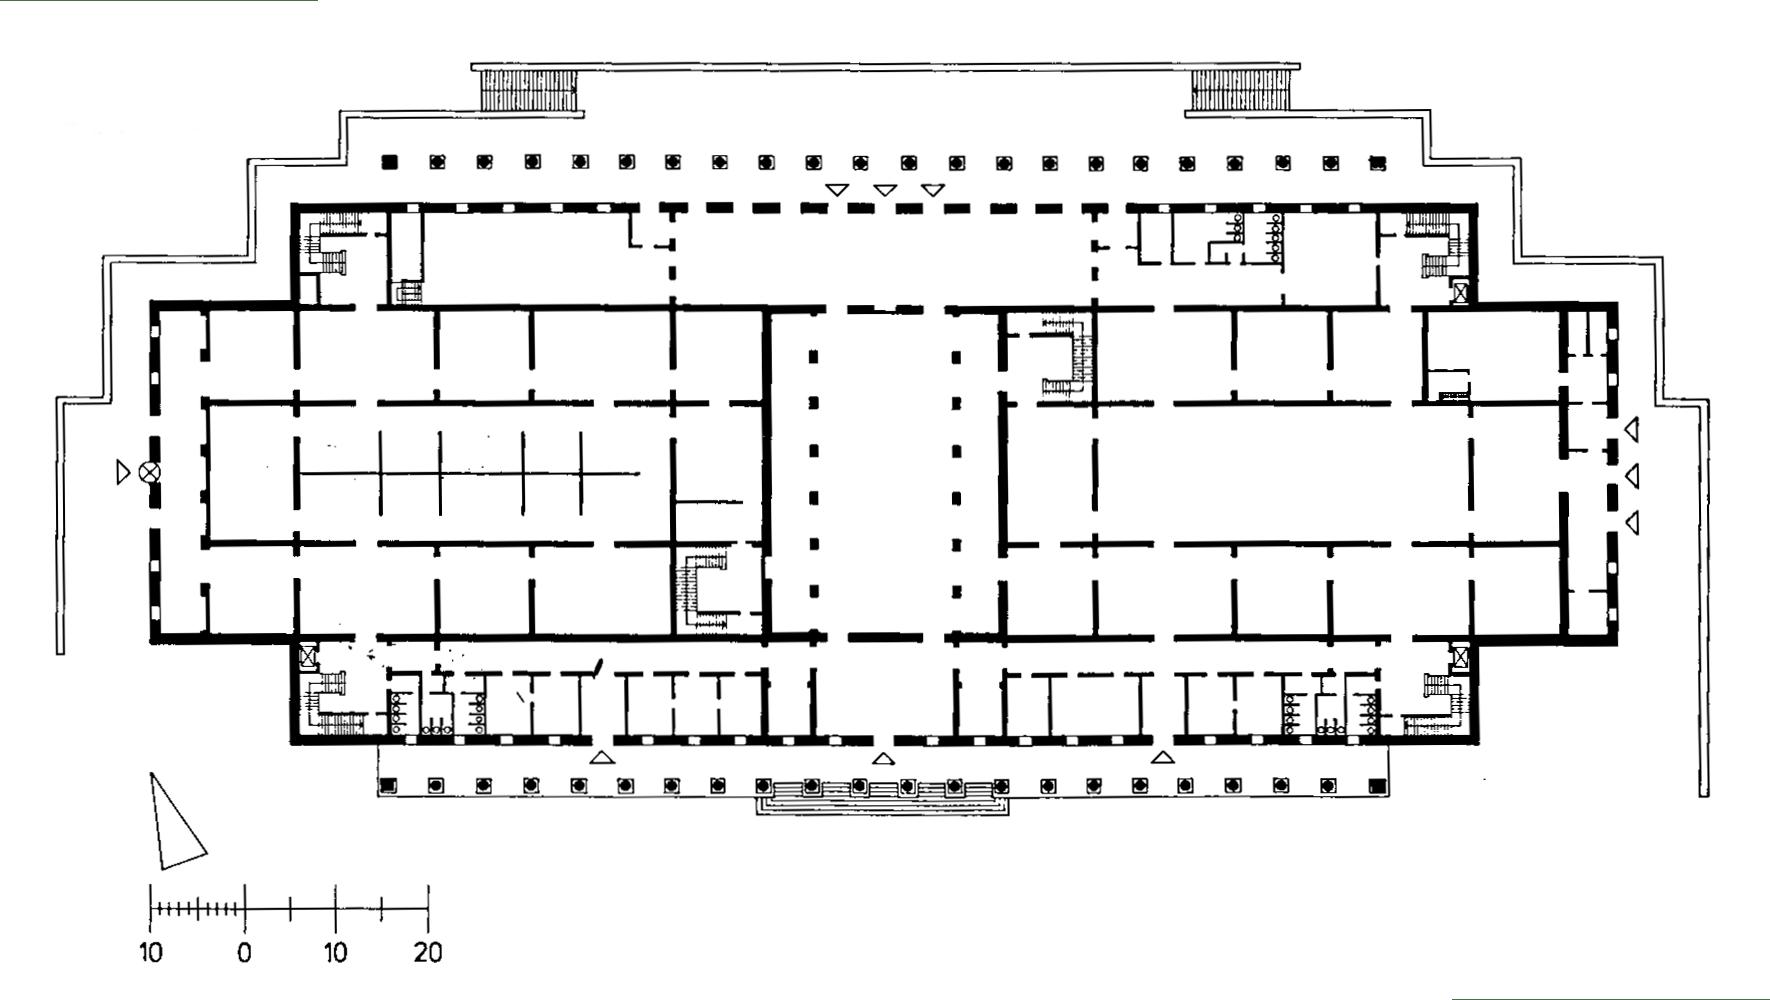 FileHaus Der Kunst Floor Planpng Wikimedia Commons